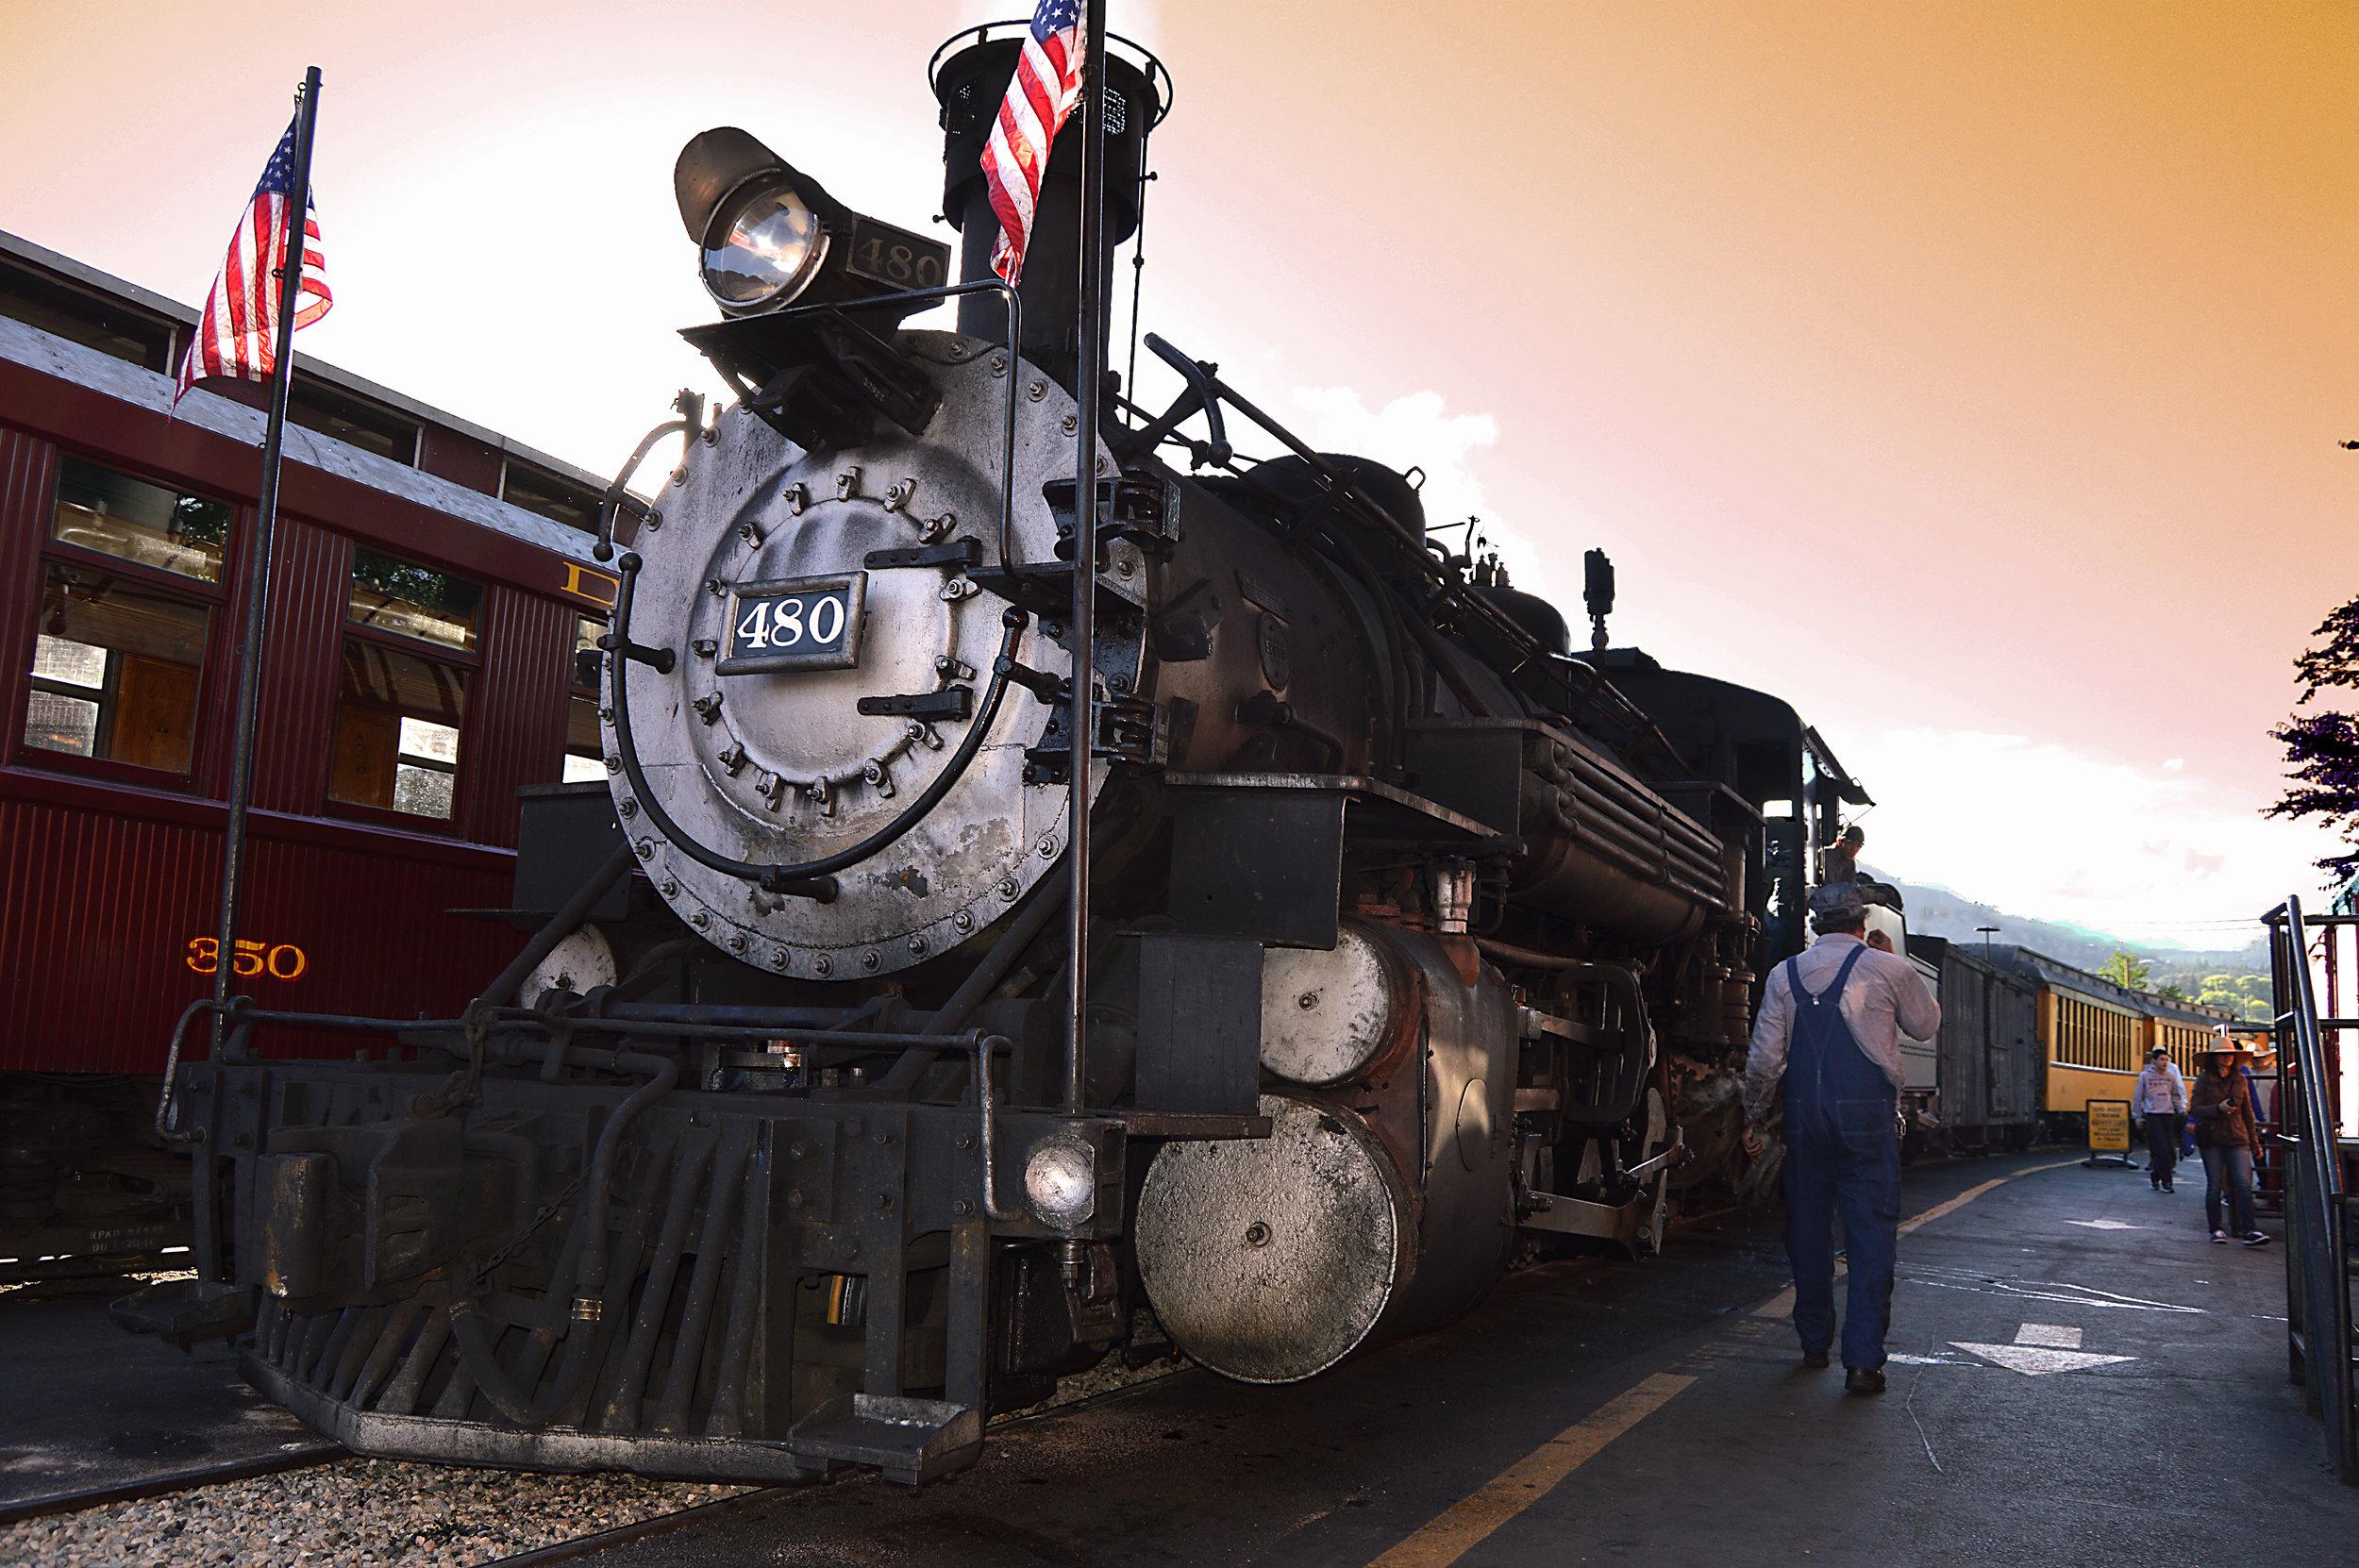 Silverton/Durango railroad